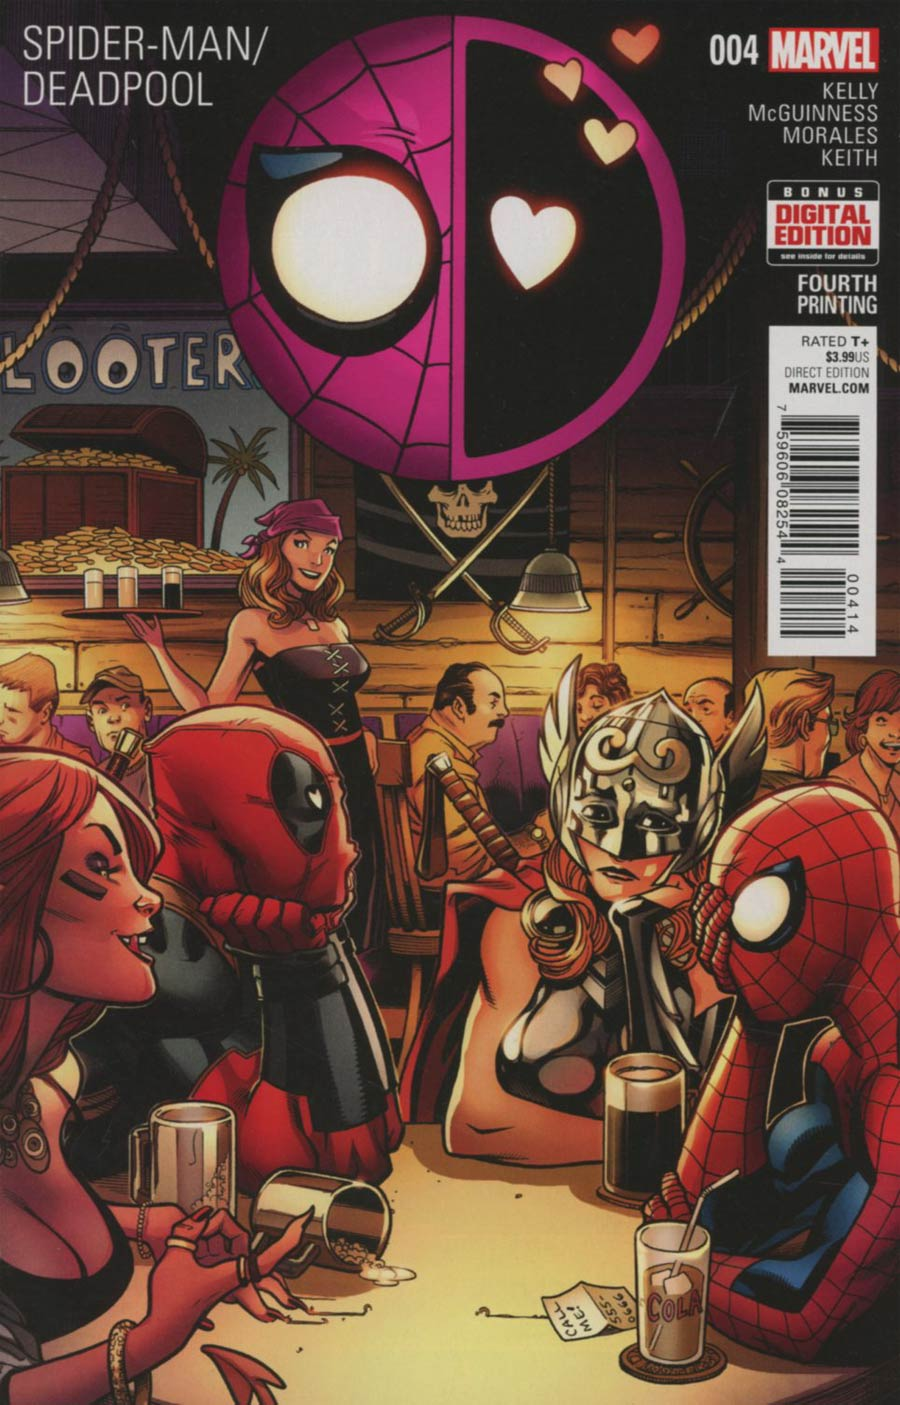 Spider-Man Deadpool #4 Cover D 4th Ptg Ed McGuinness Variant Cover